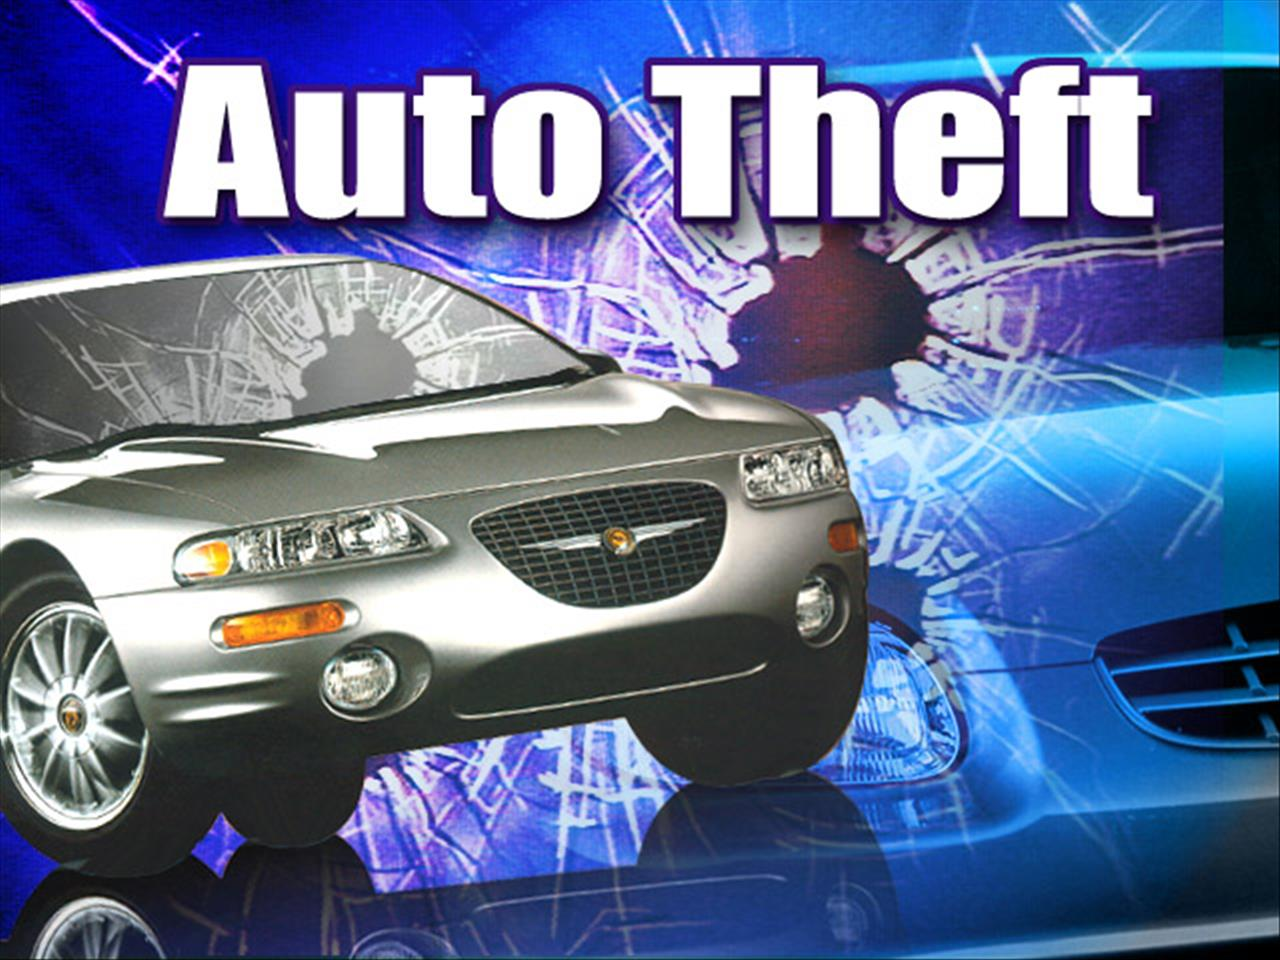 AutoTheft_1436539515288.jpg